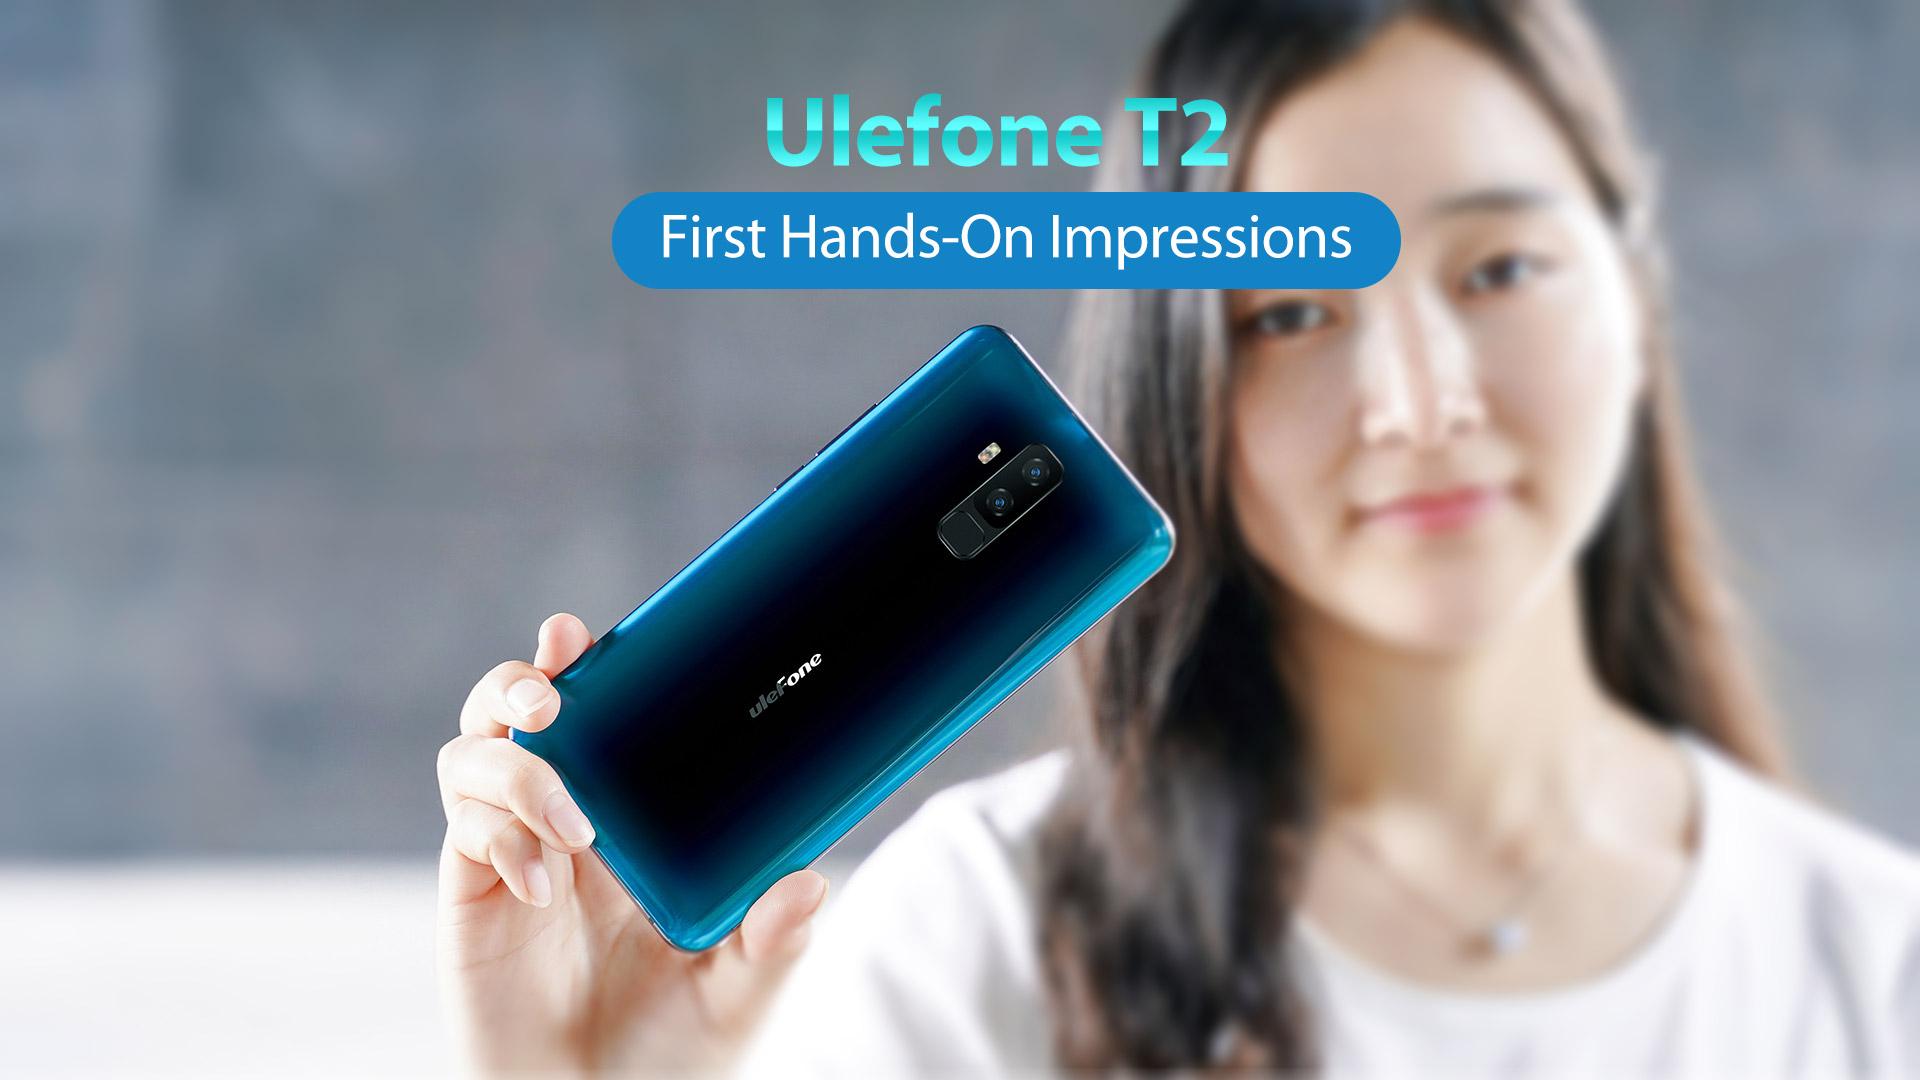 ULEFONE T2官方评测视频发布